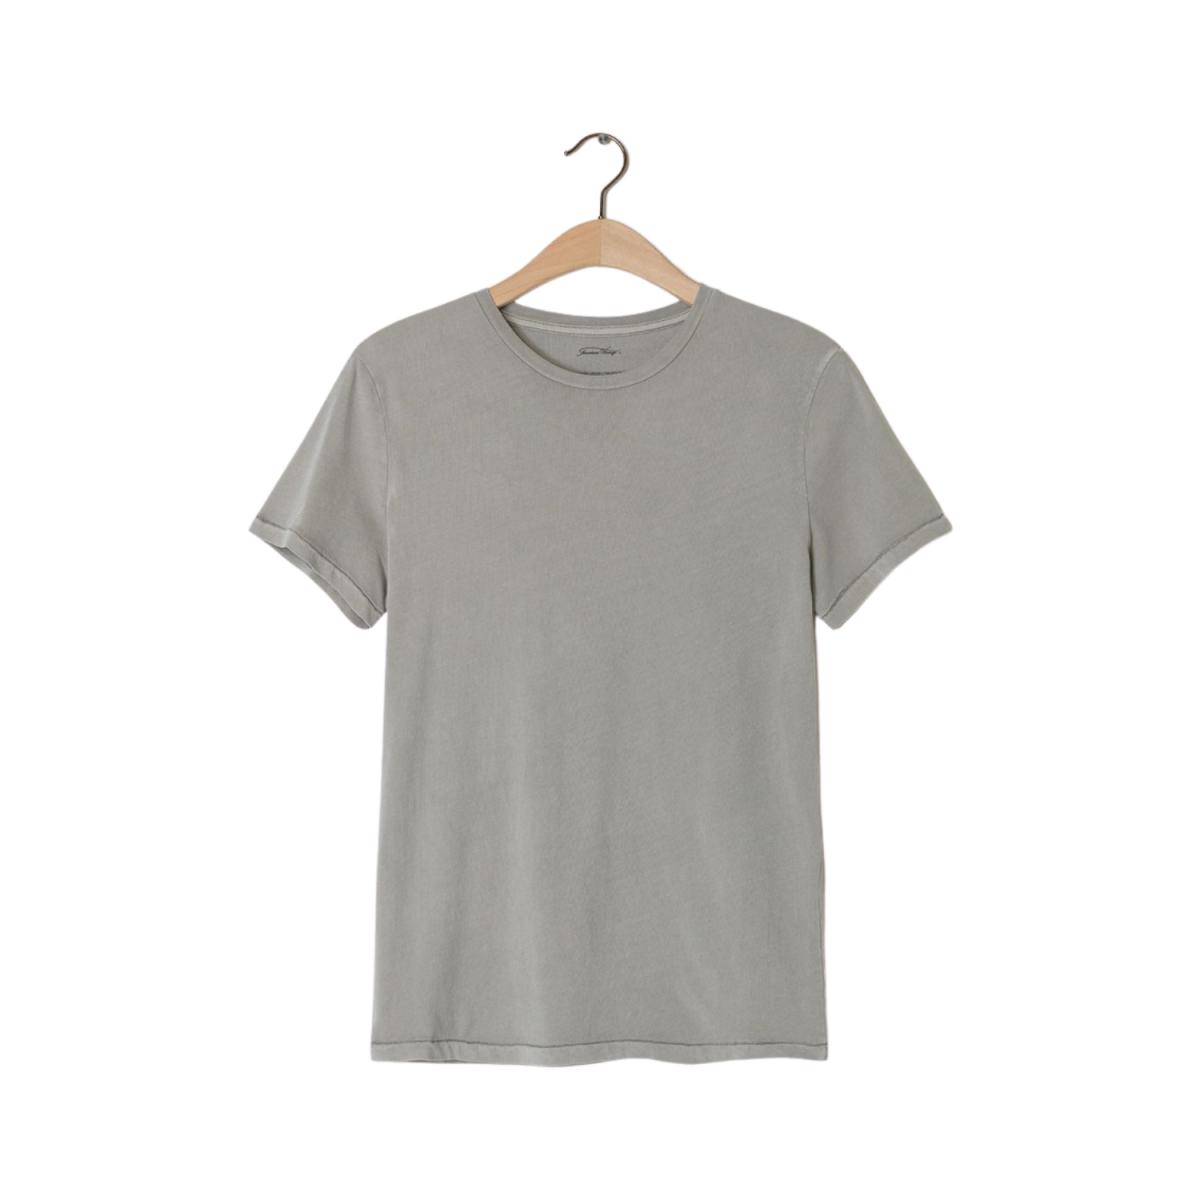 vegiflower t-shirt - baby mouse